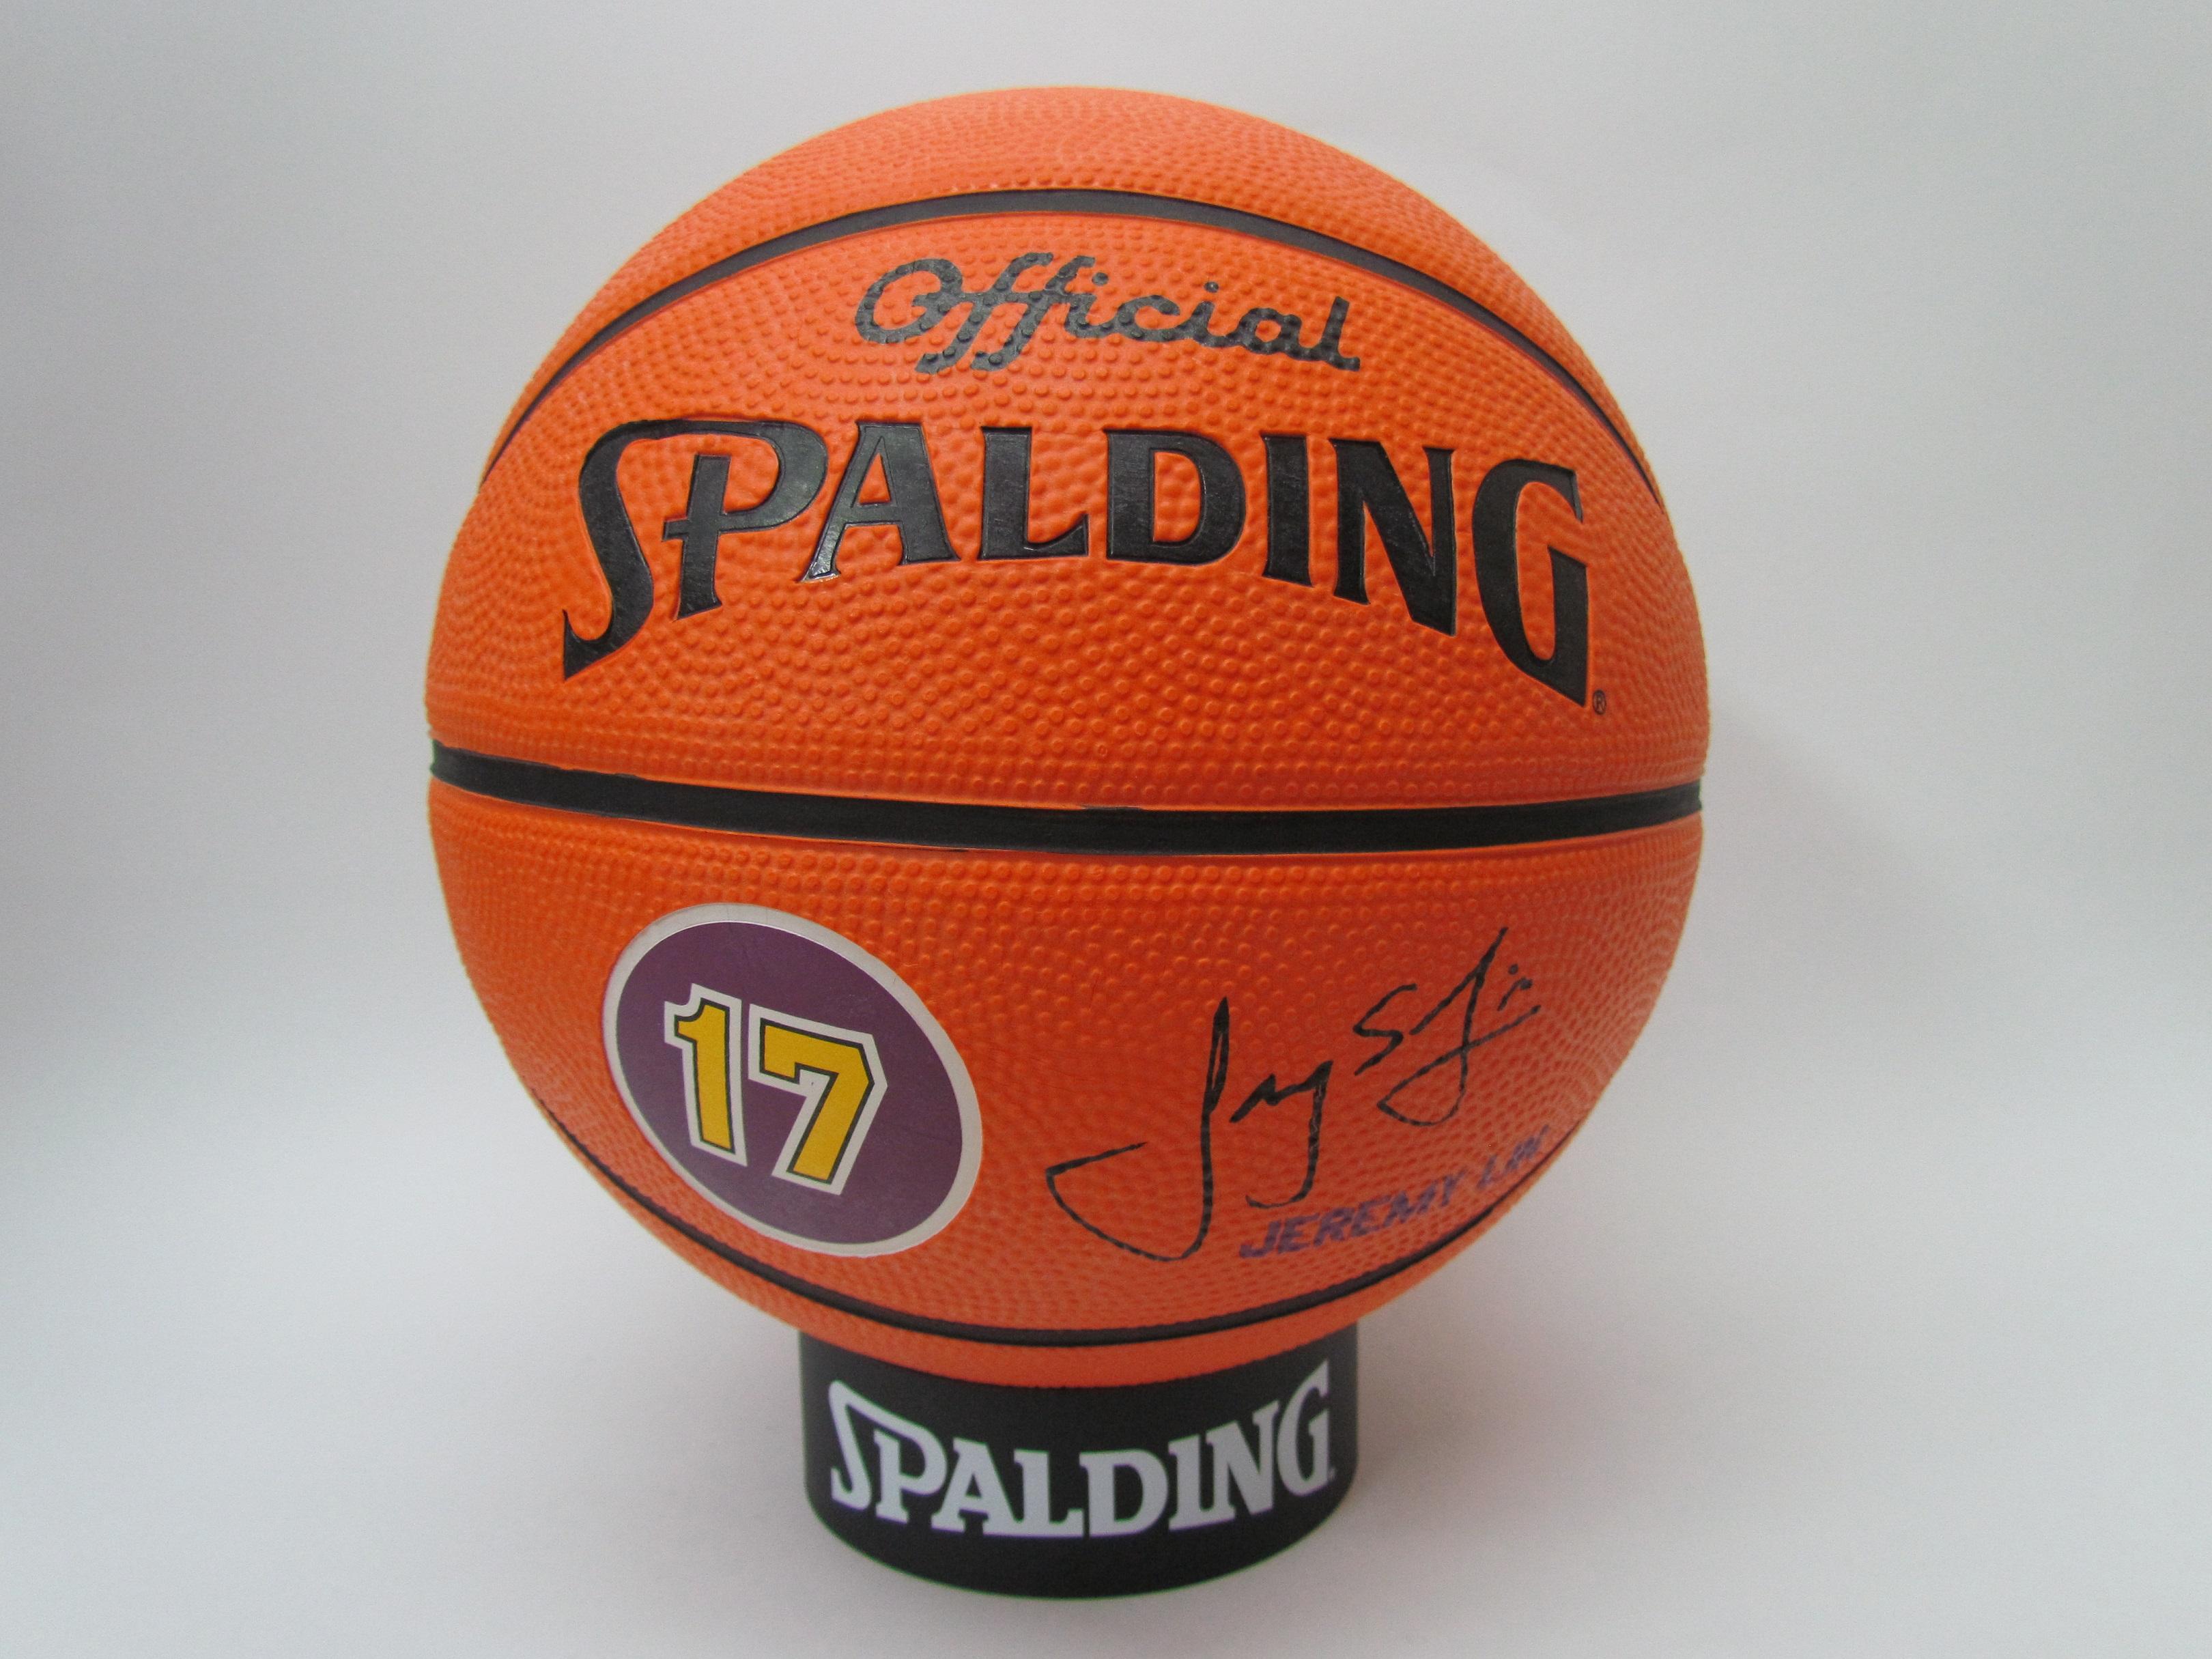 SPALDING專業籃球 NBA球員球系列 湖人隊 林書豪Jeremy Lin #17